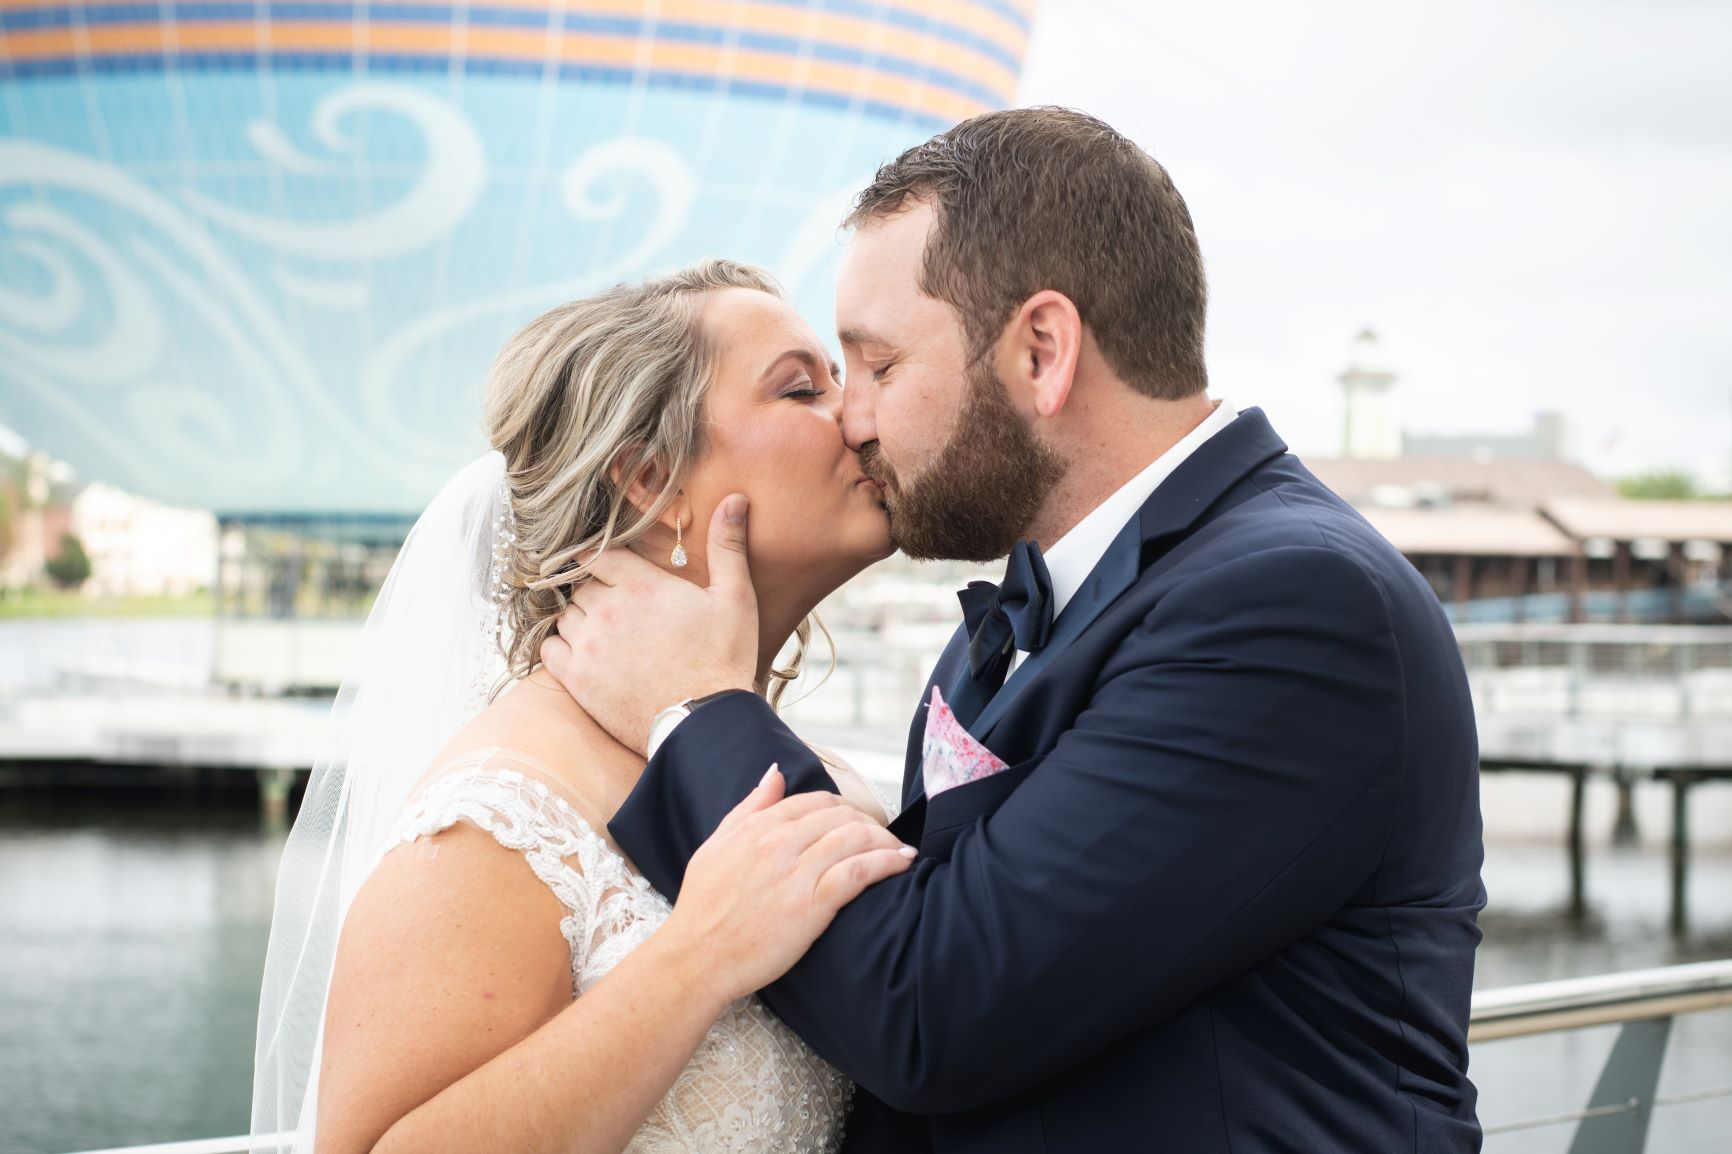 Romantic New Year's Wedding   Alyssa and Daniel at Paddlefish Disney Springs